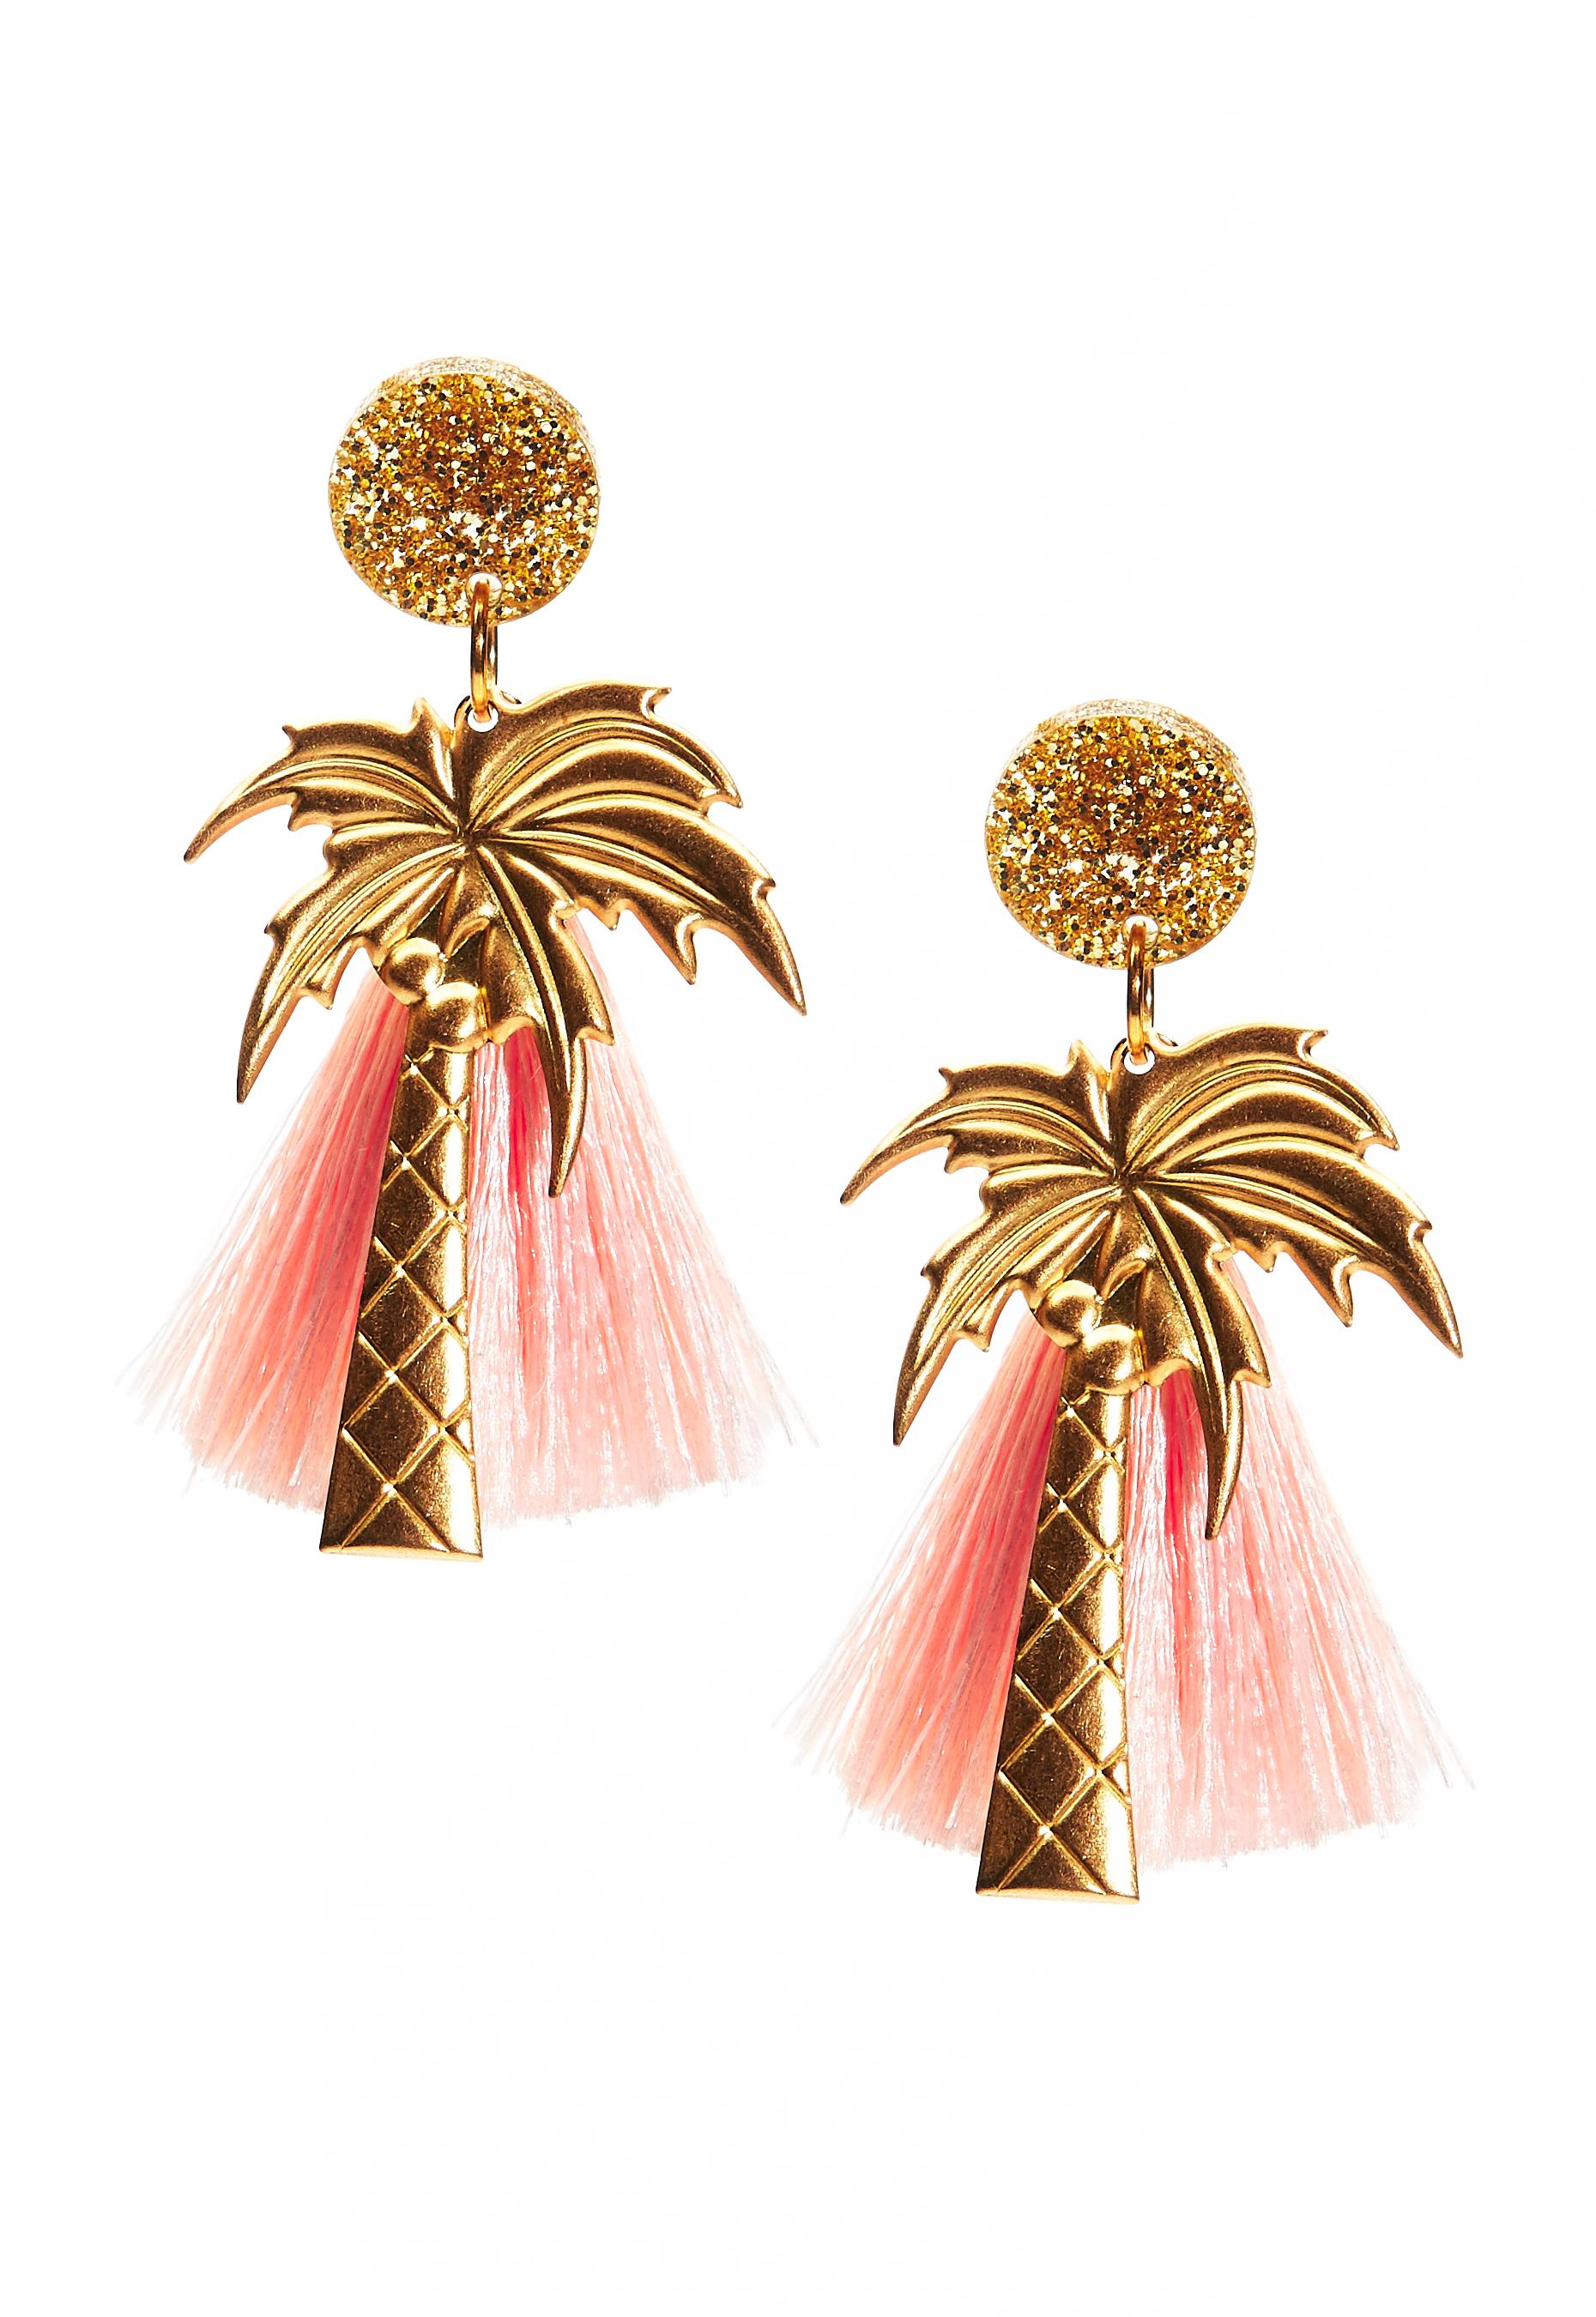 WOS Palm Trees Earrings GuldfärgadAprikos Bubbleroom